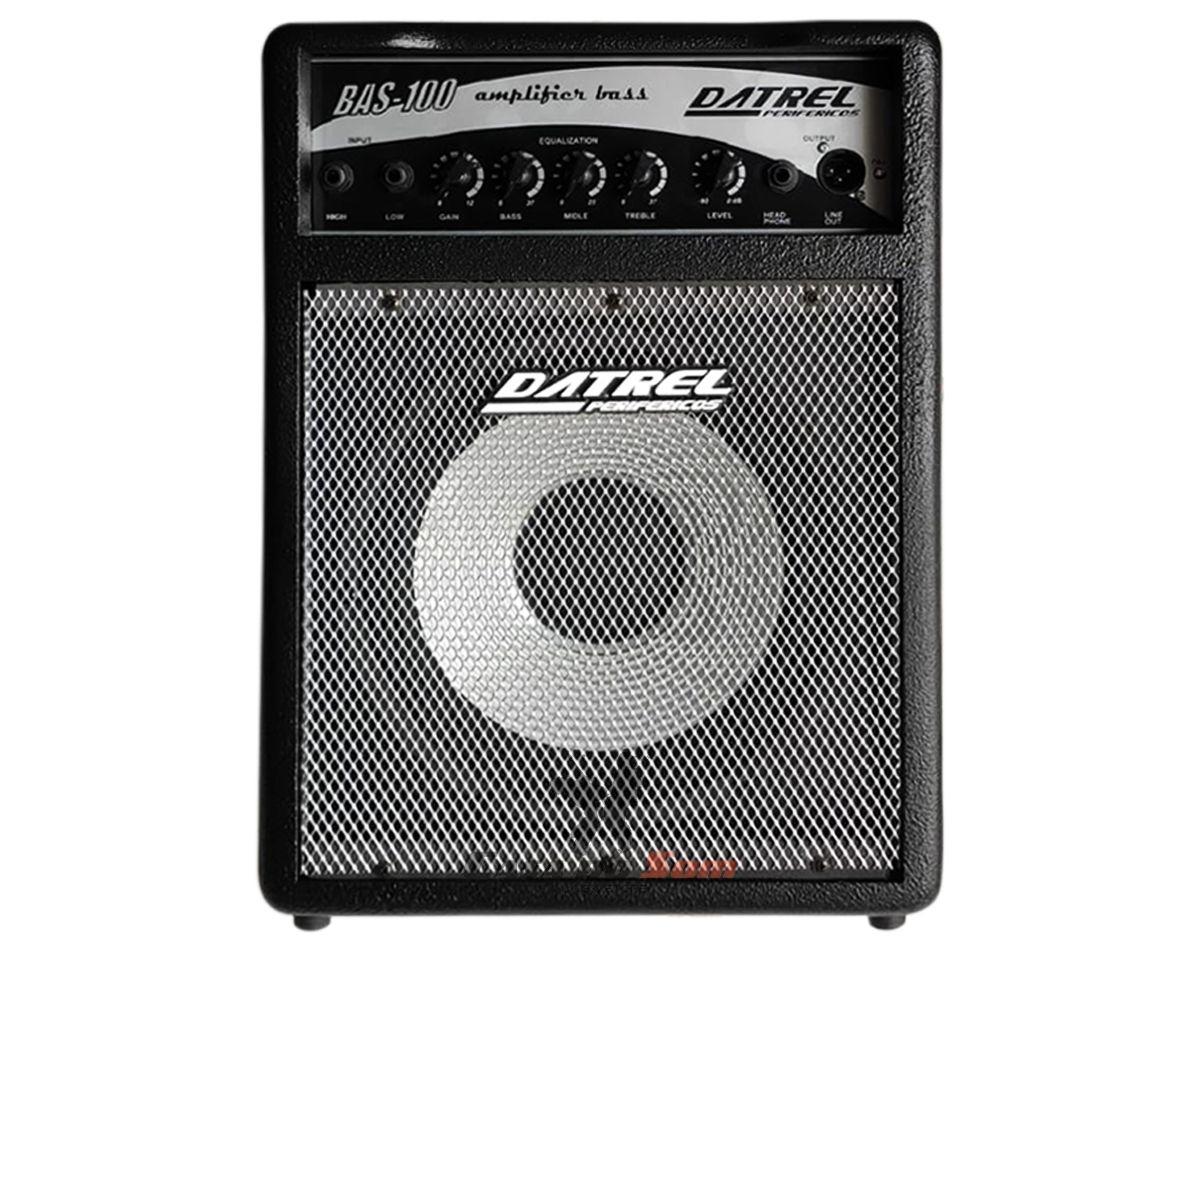 Amplificador de Contra Baixo Datrel BAS100 100w